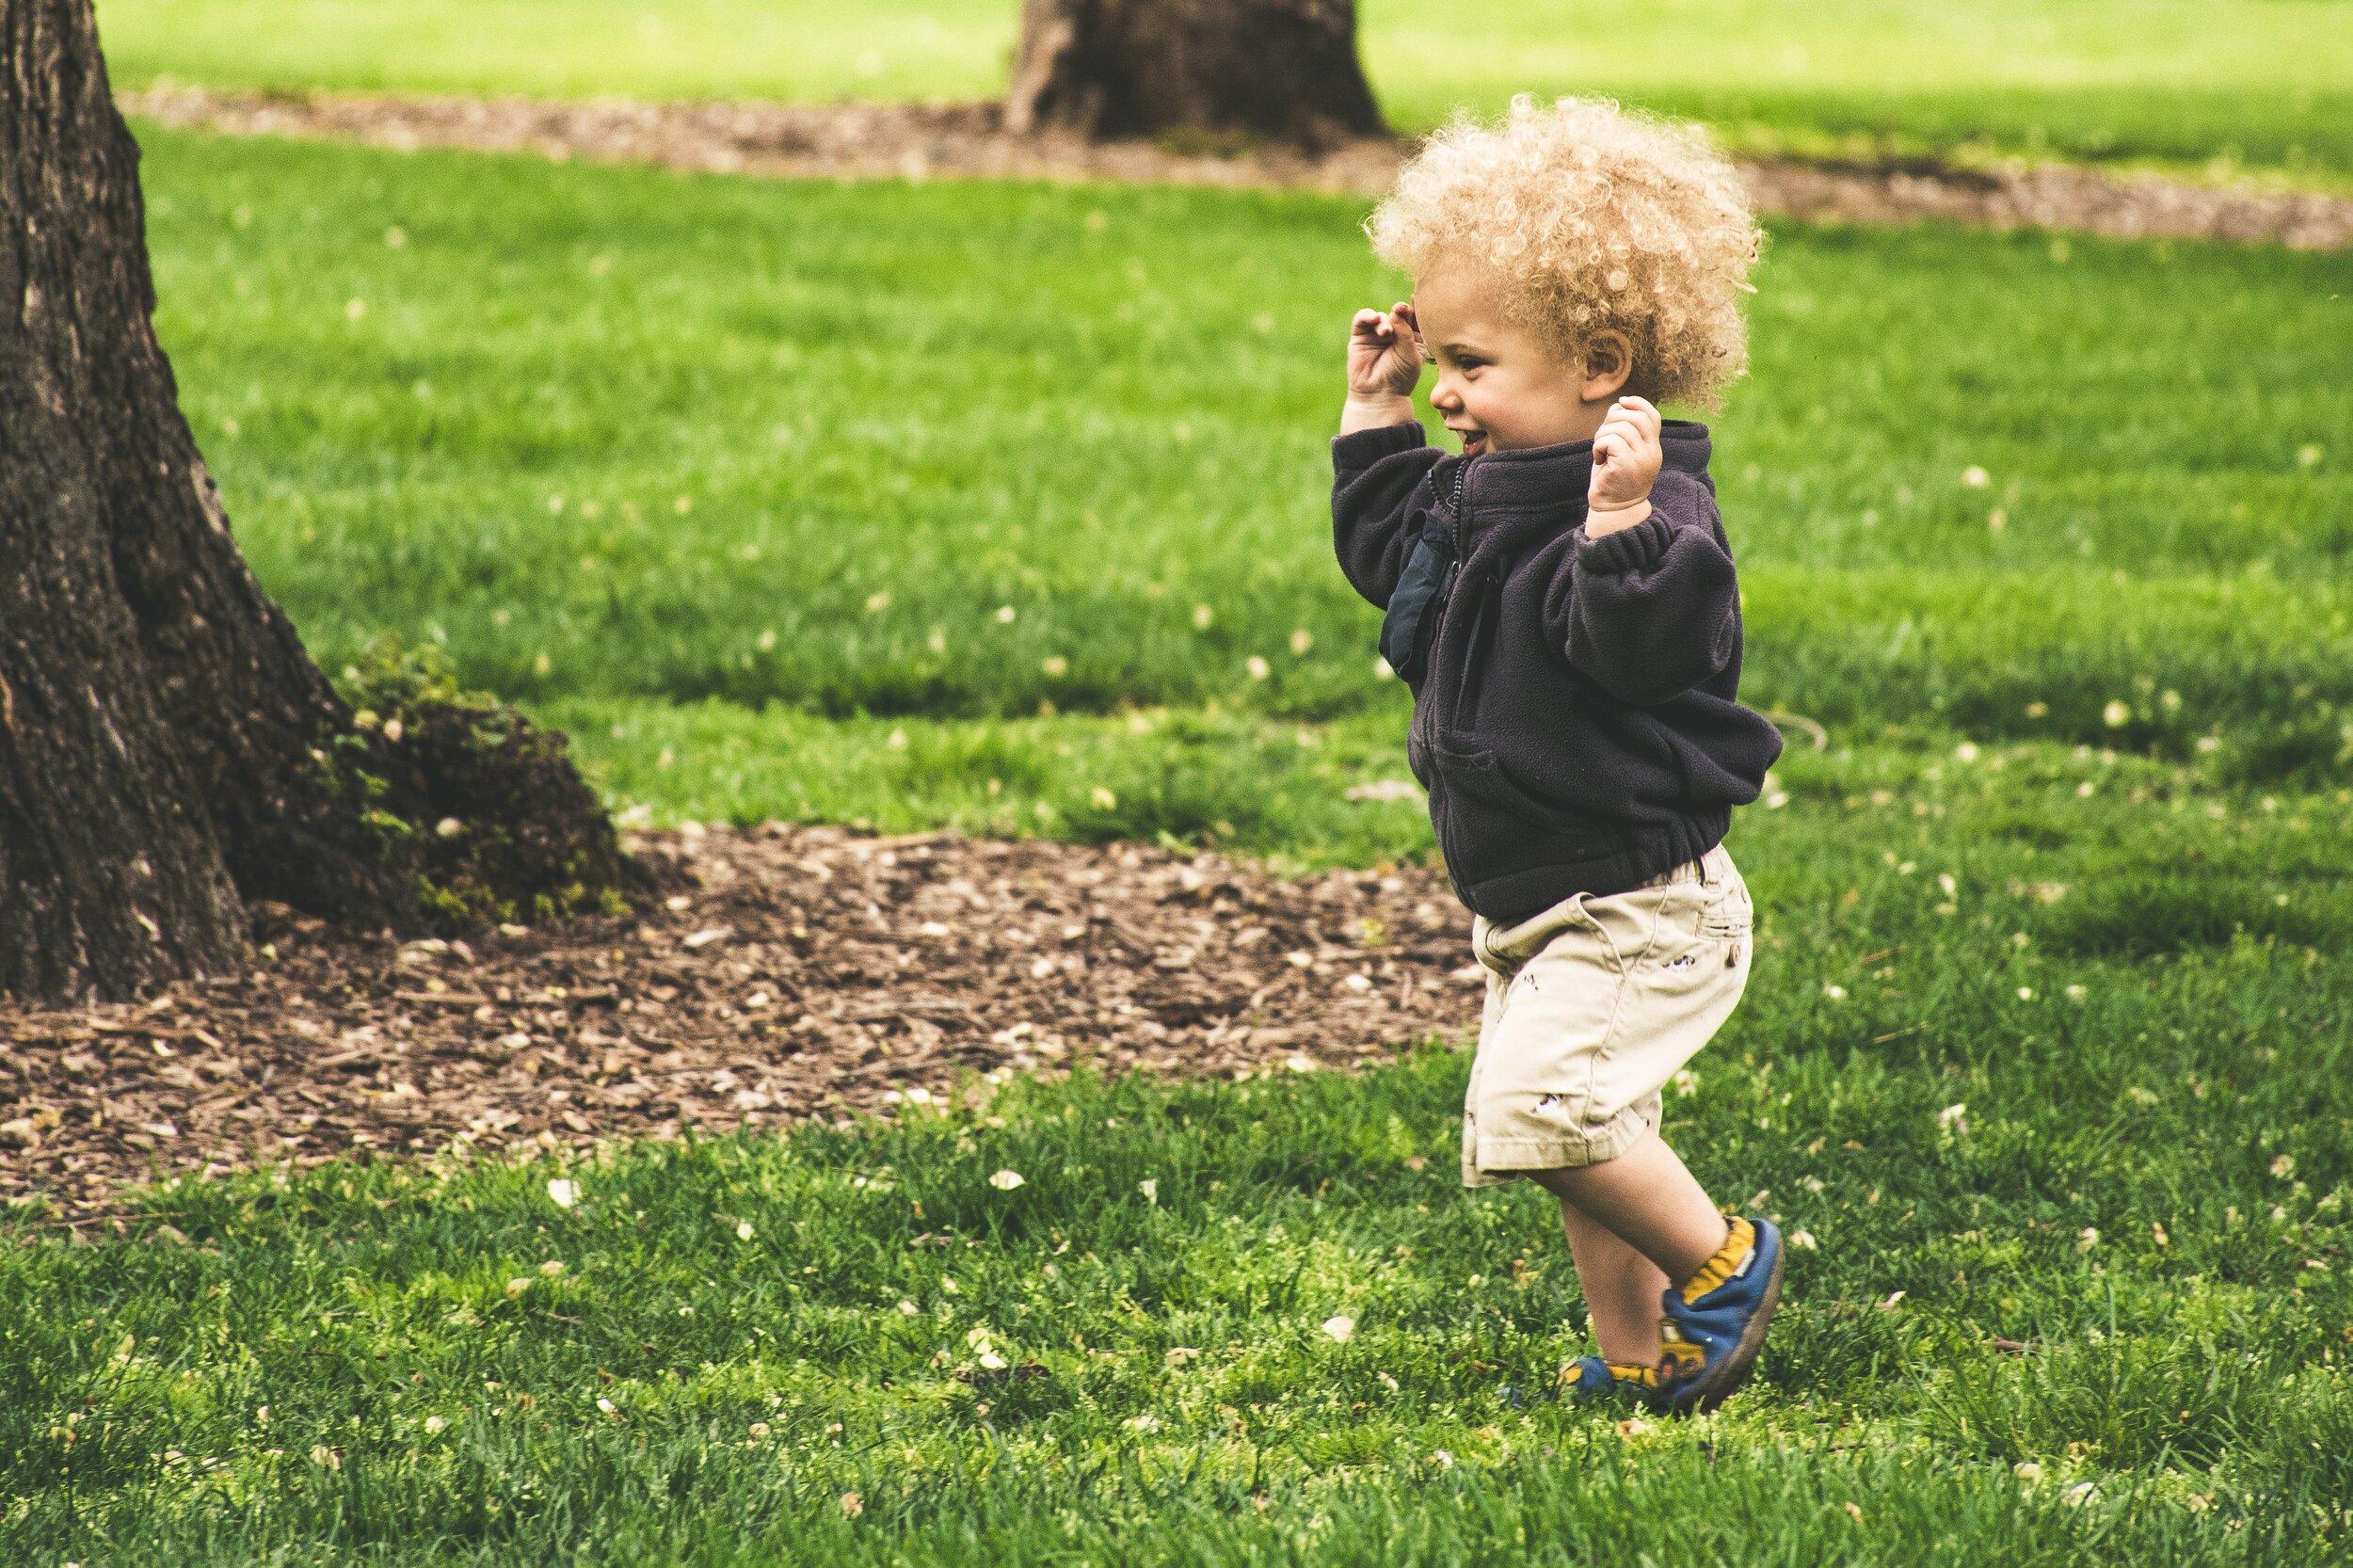 photo-of-toddler-running-1073088.jpg